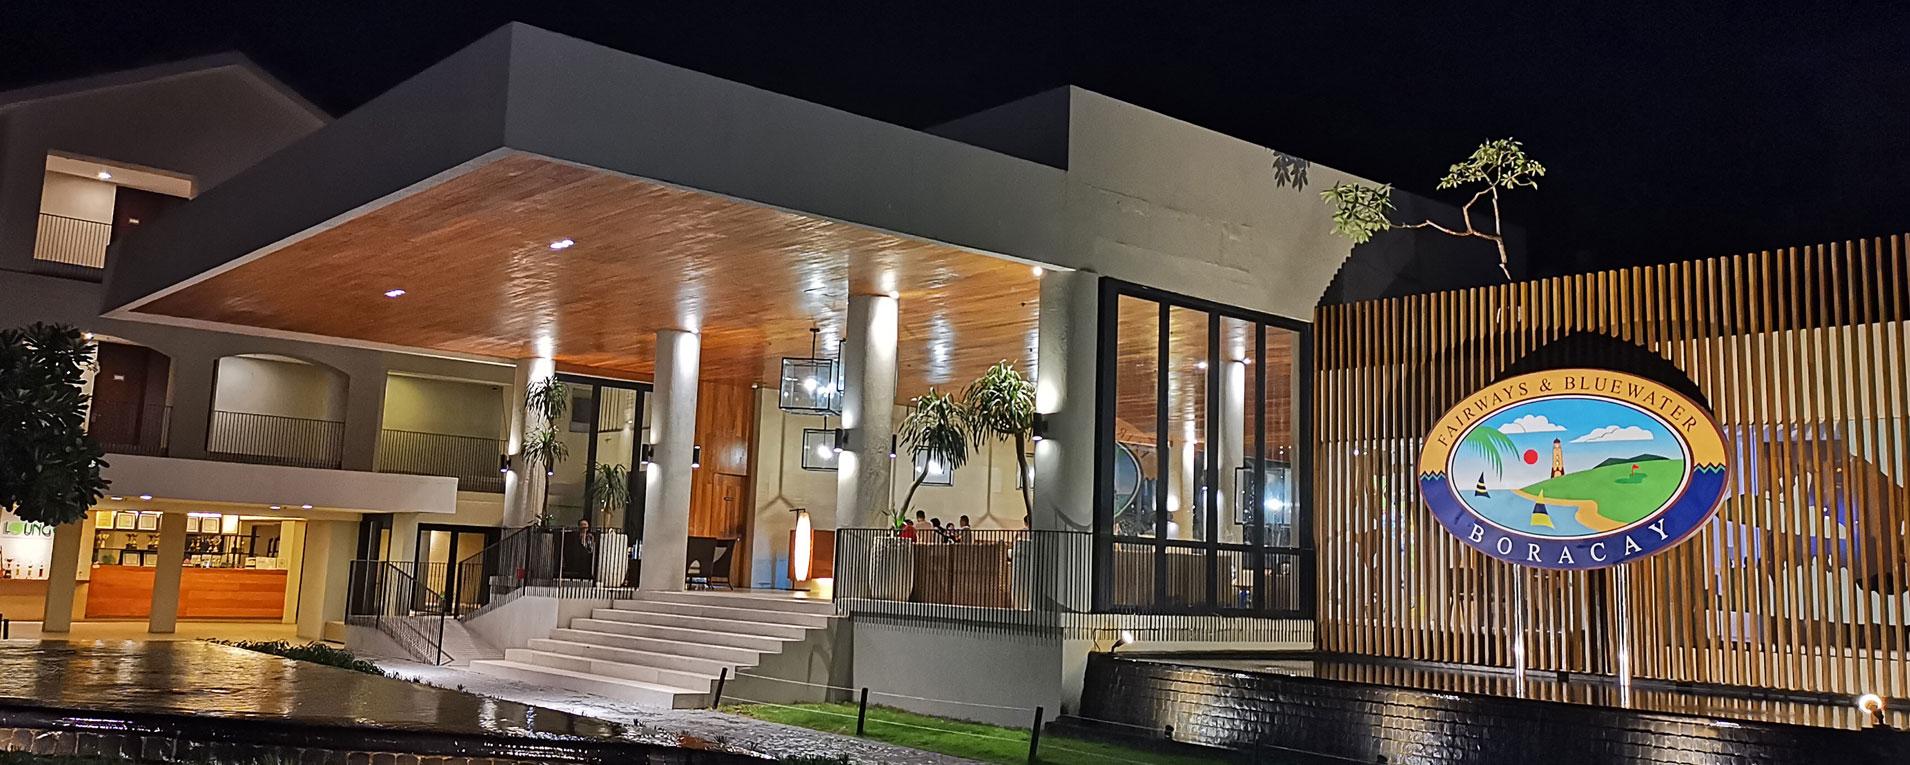 Fairways And Bluewater Boracay Resort A Hotel In Boracay